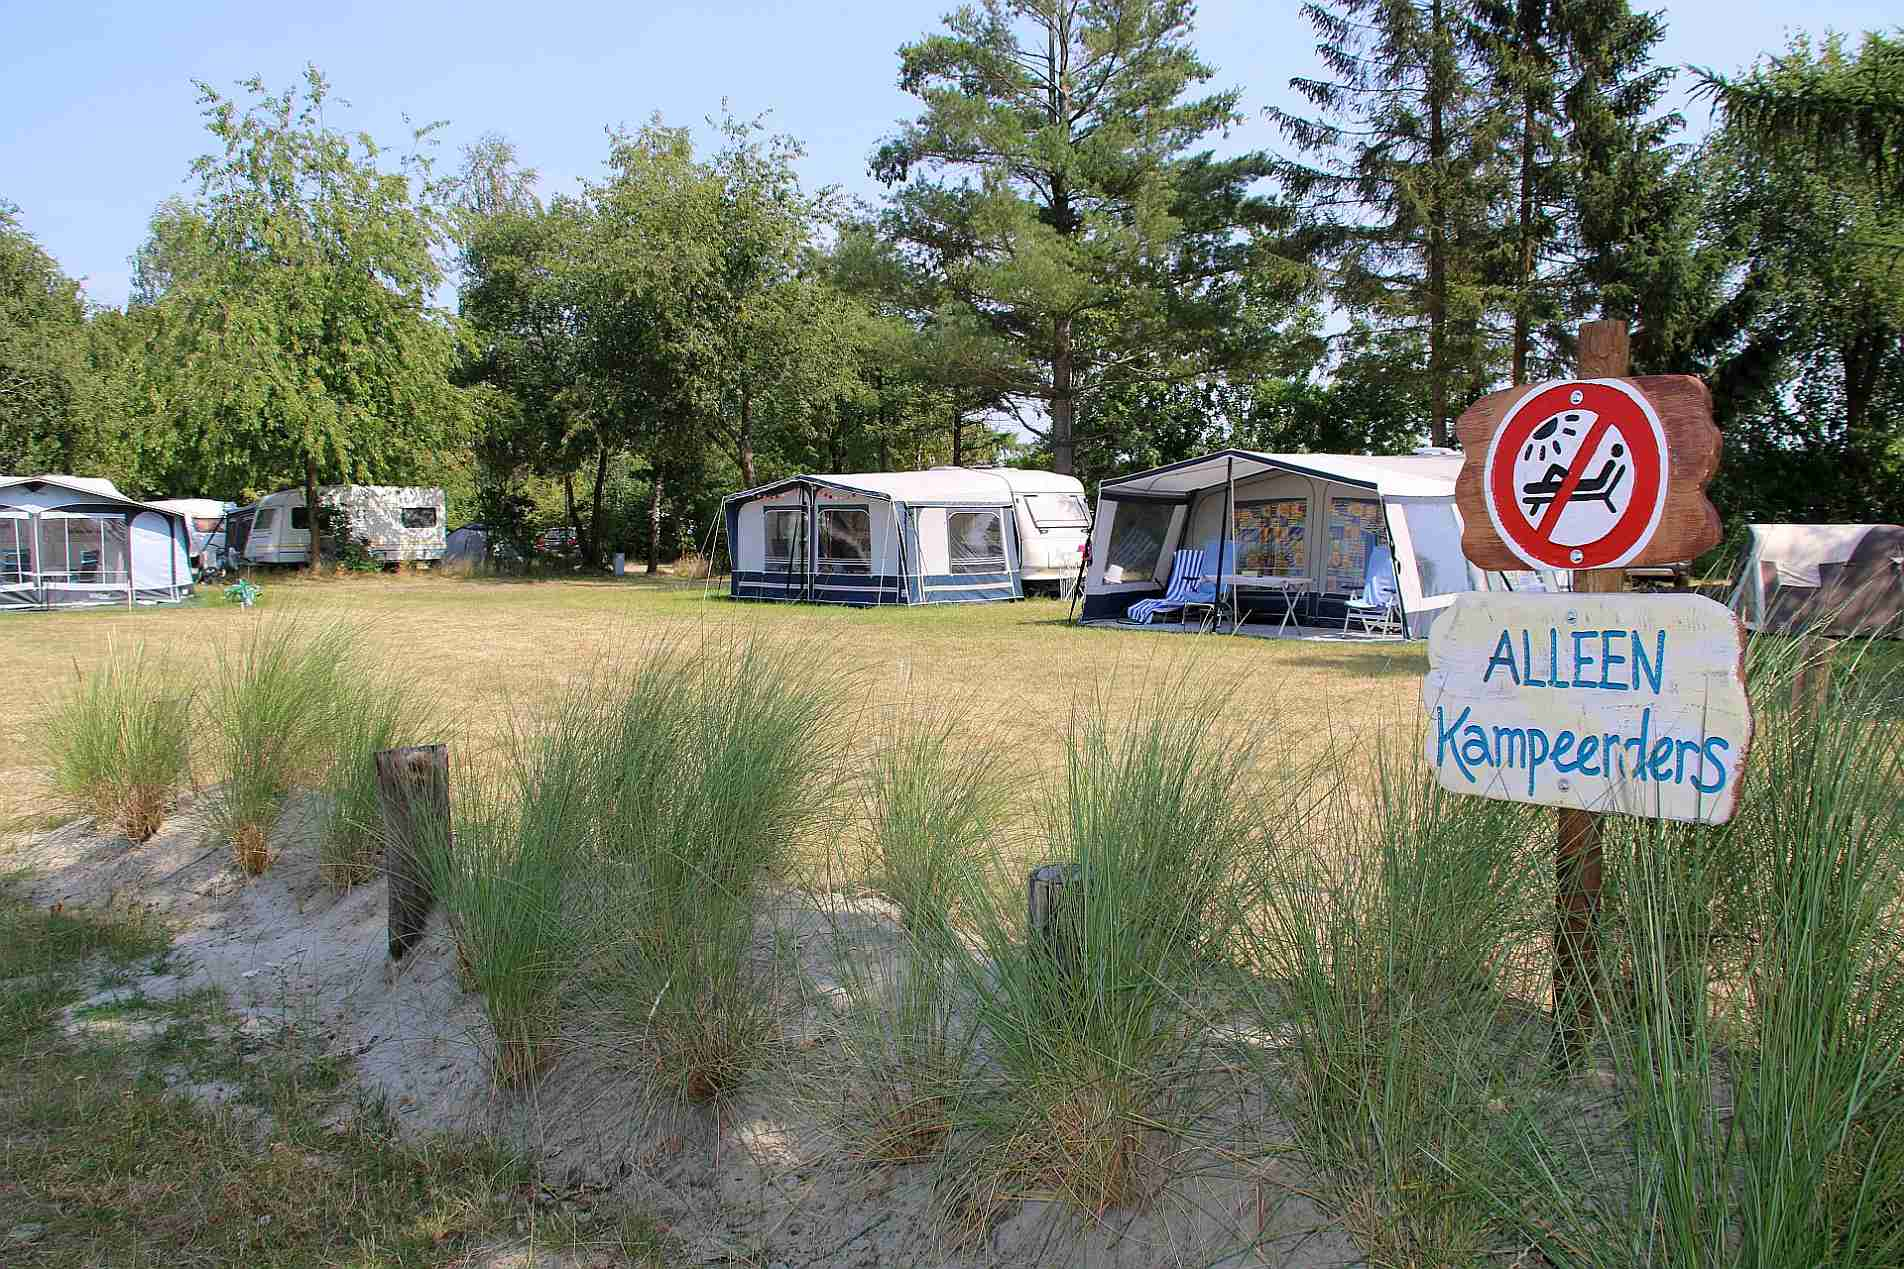 Gezinscamping in Hardenberg met unieke strandvakantie - Mooie gezinscamping in Hardenberg